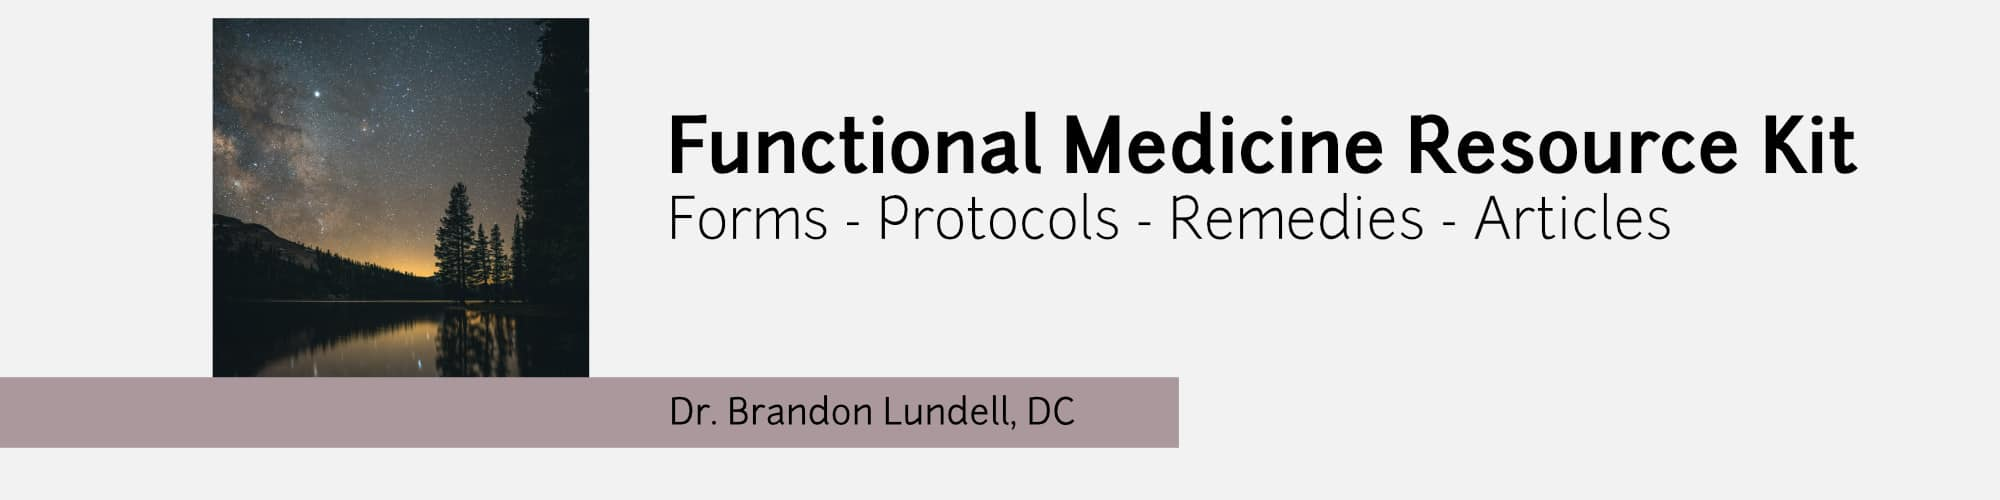 Functional Medicine Resource Kit